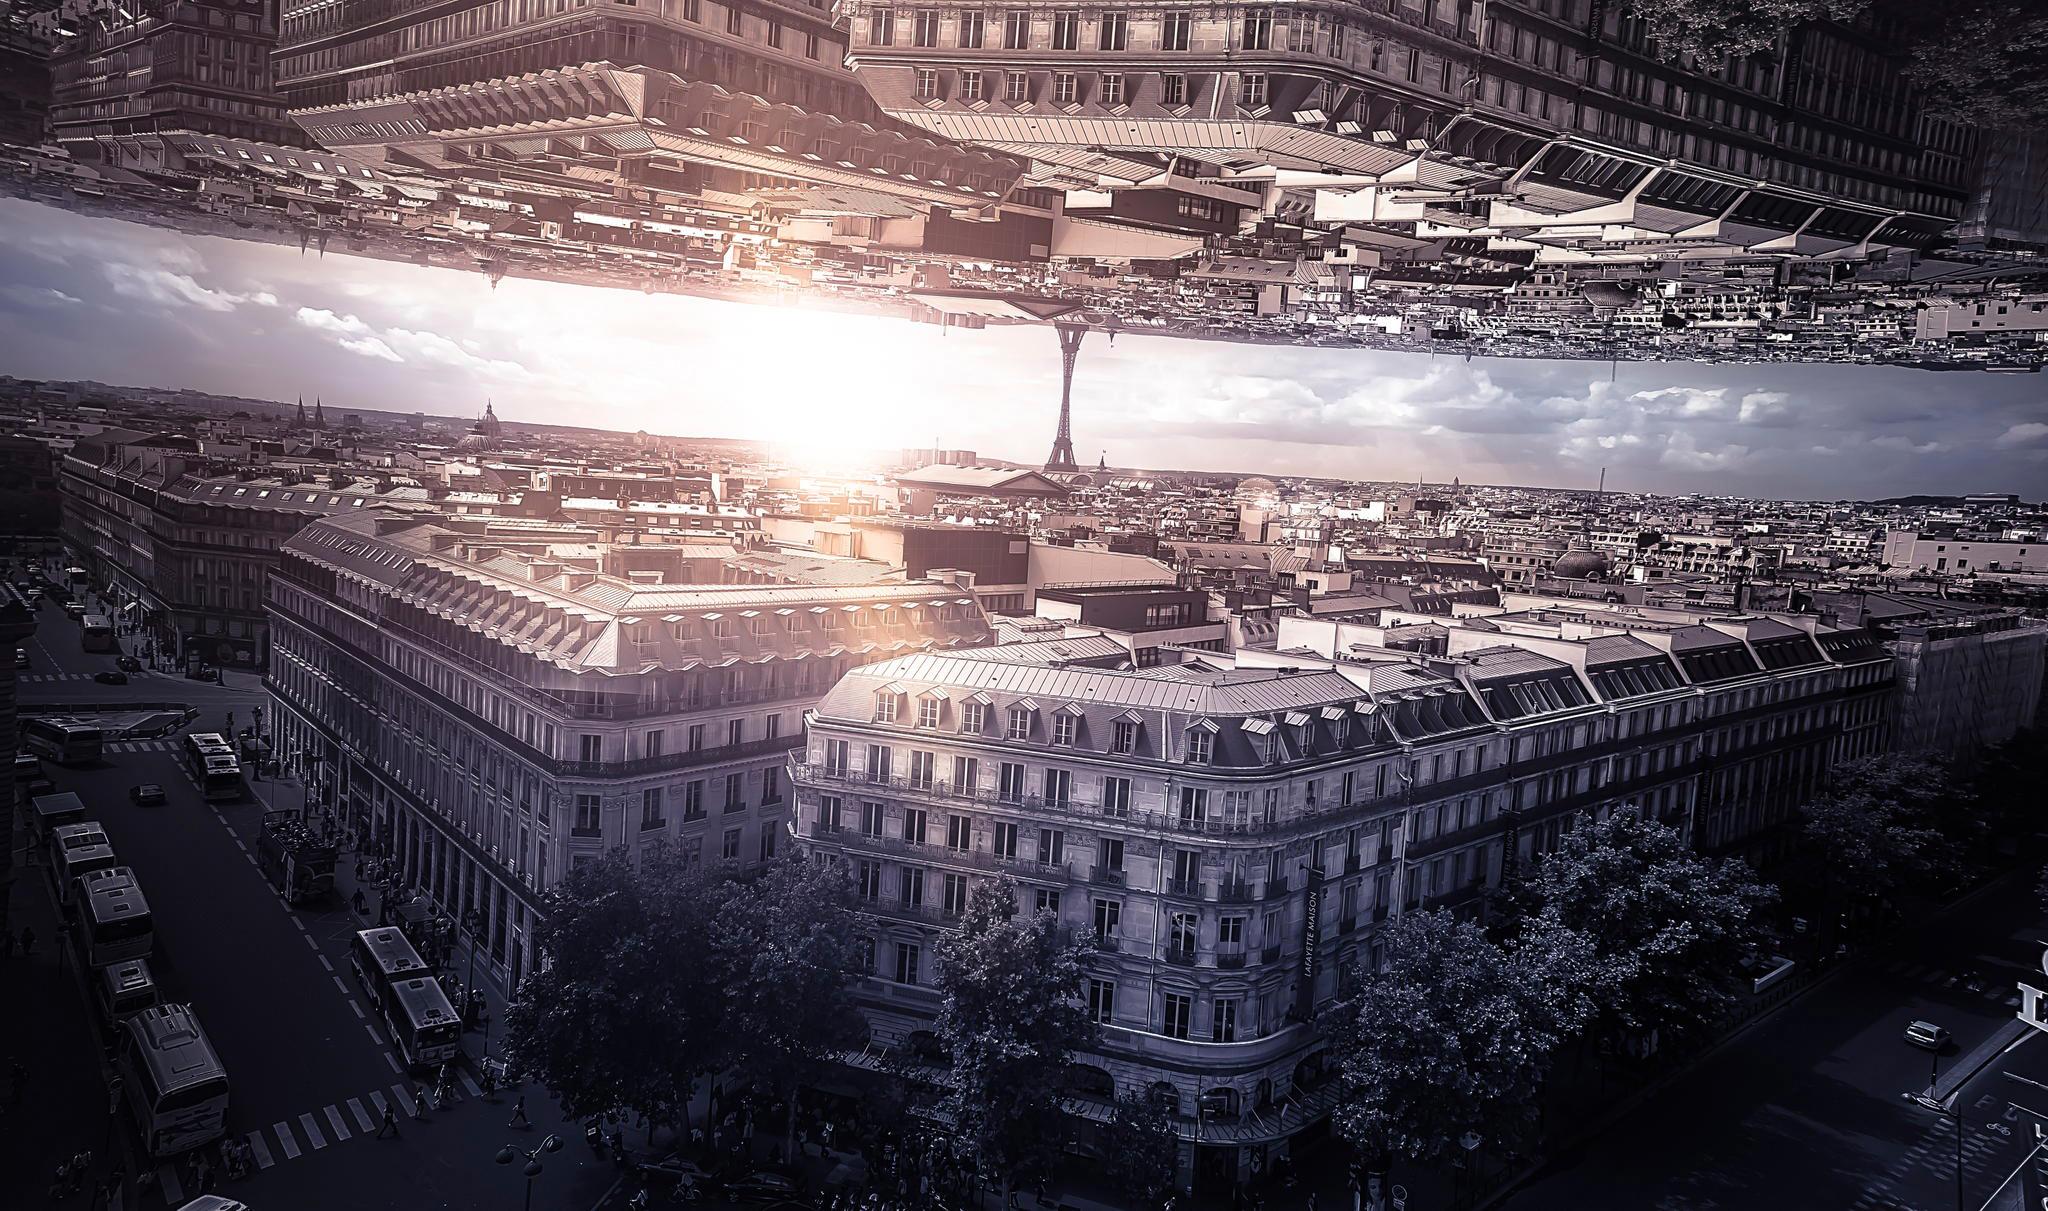 Inception-Wallpaper-City-9 jpg